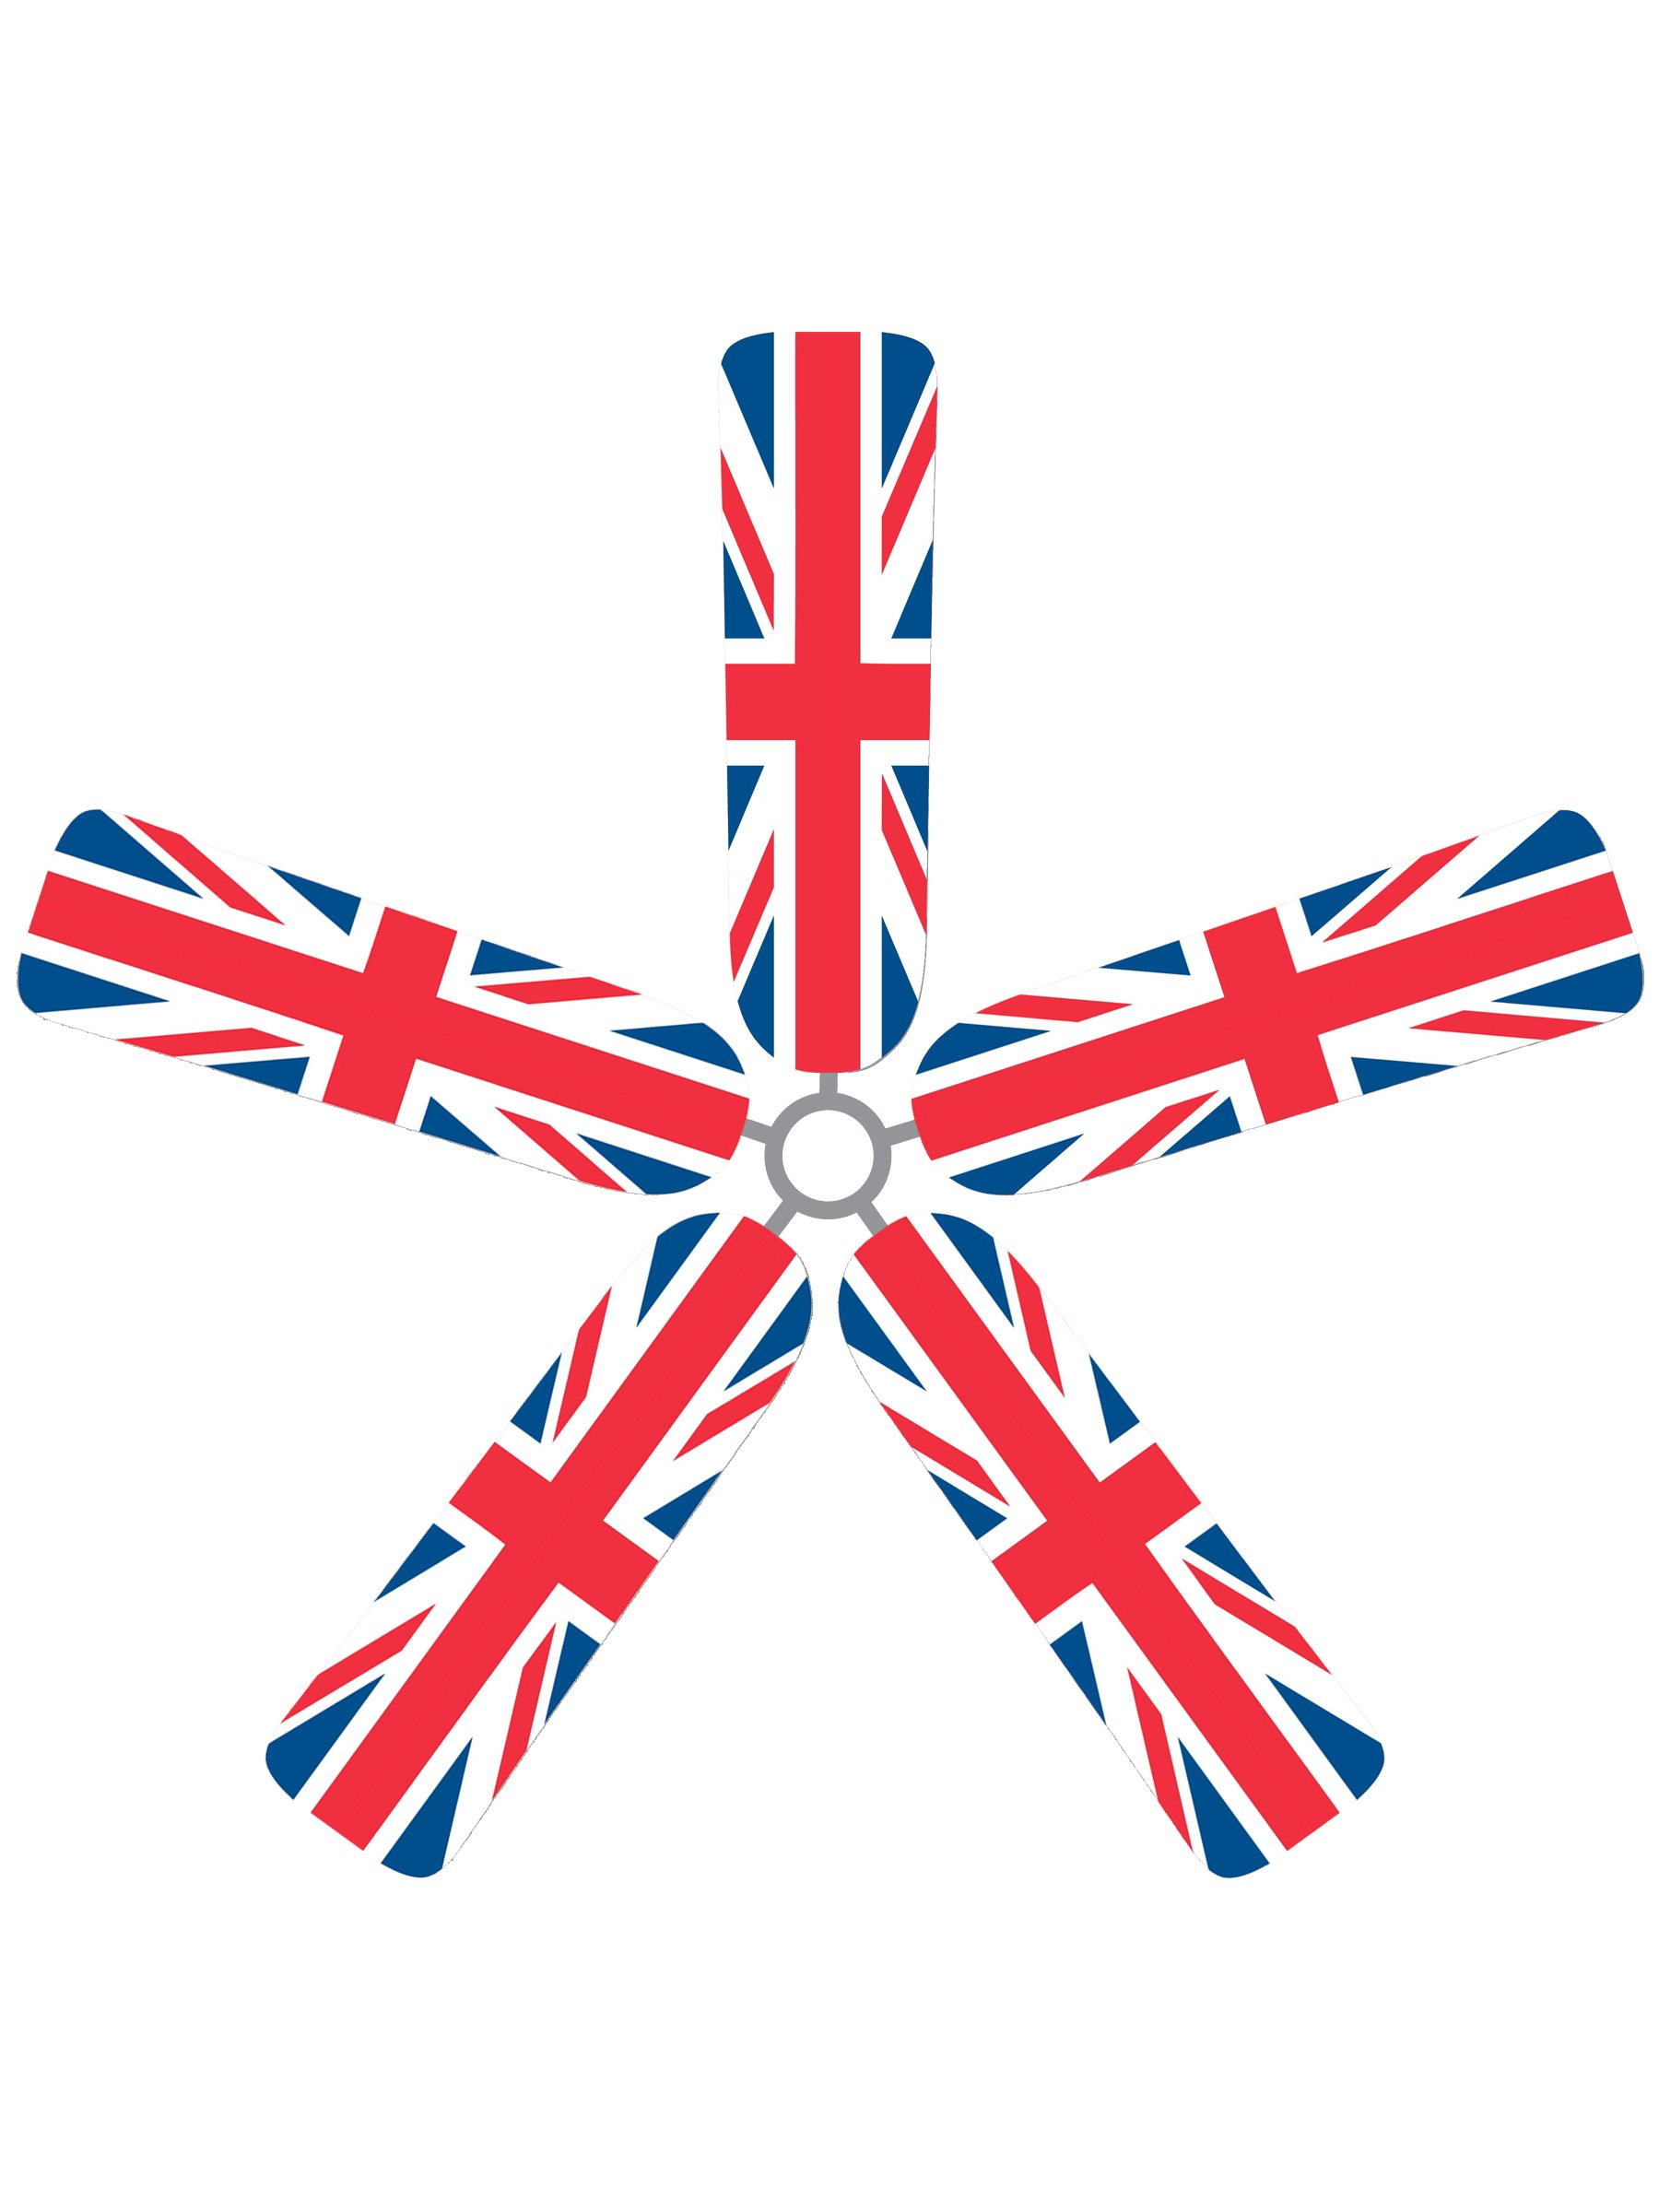 Fan Blade Designs 9K-GGH-C2NM Ceiling Fan Blade Covers, British Flag by Fan Blade Designs